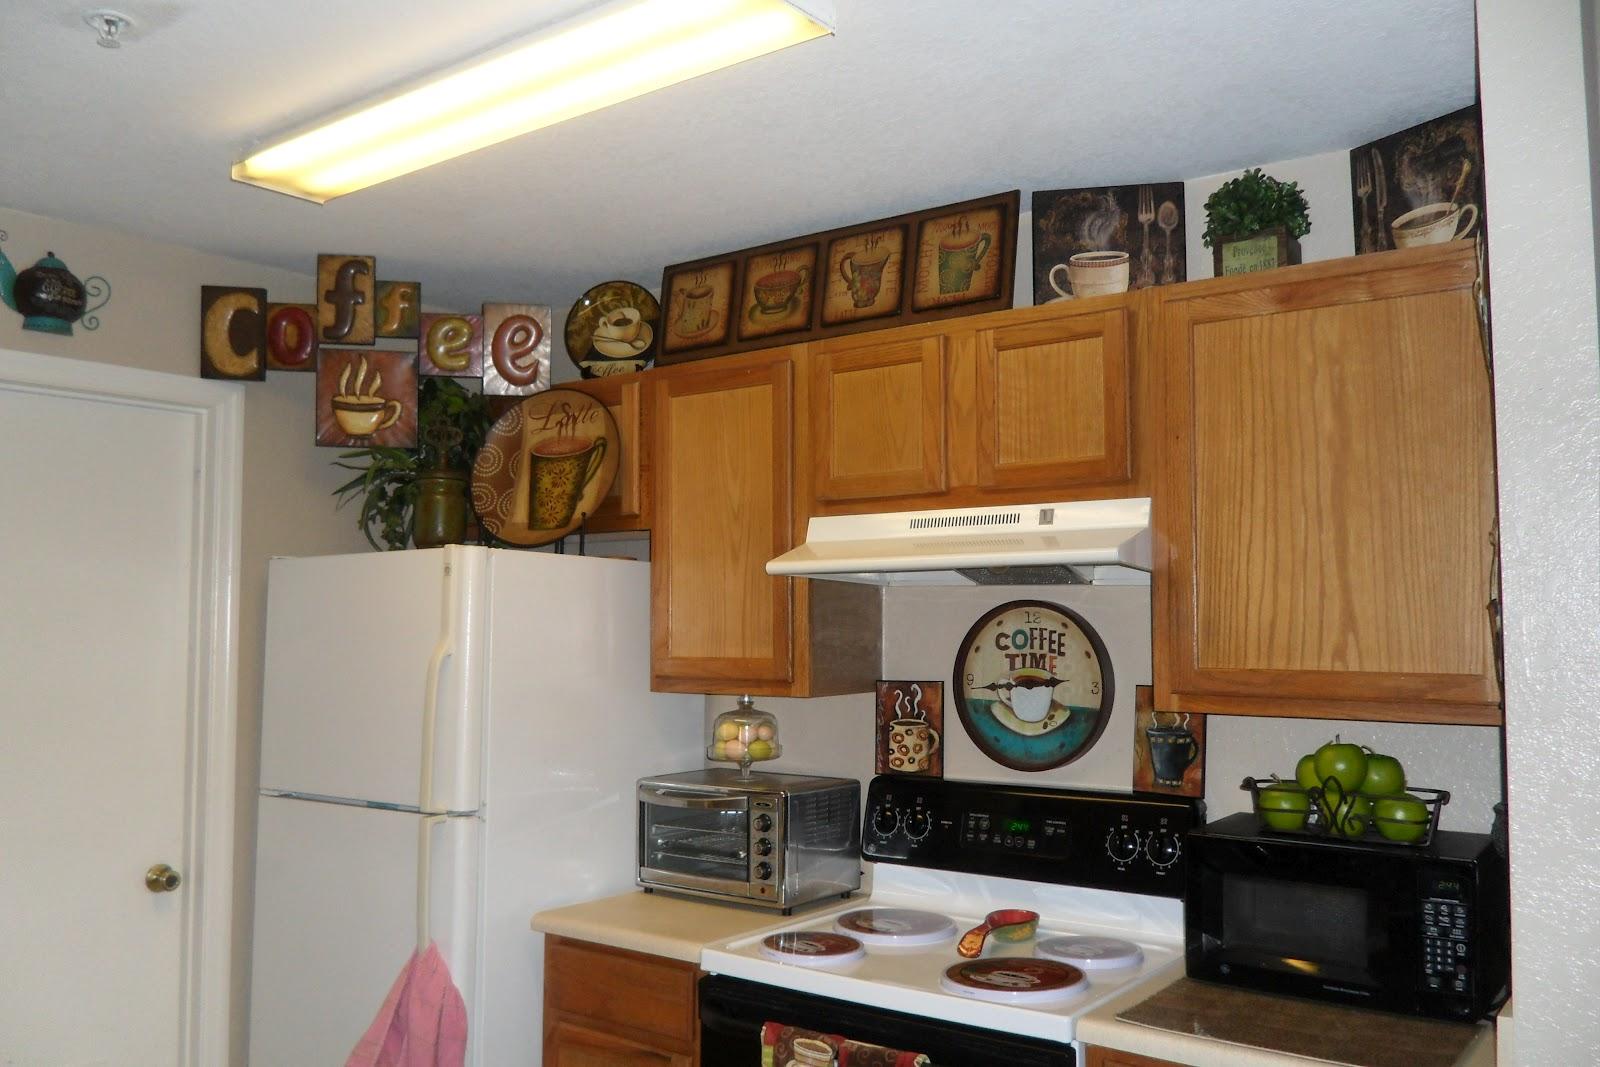 Coffee wall decor kitchen photo - 2